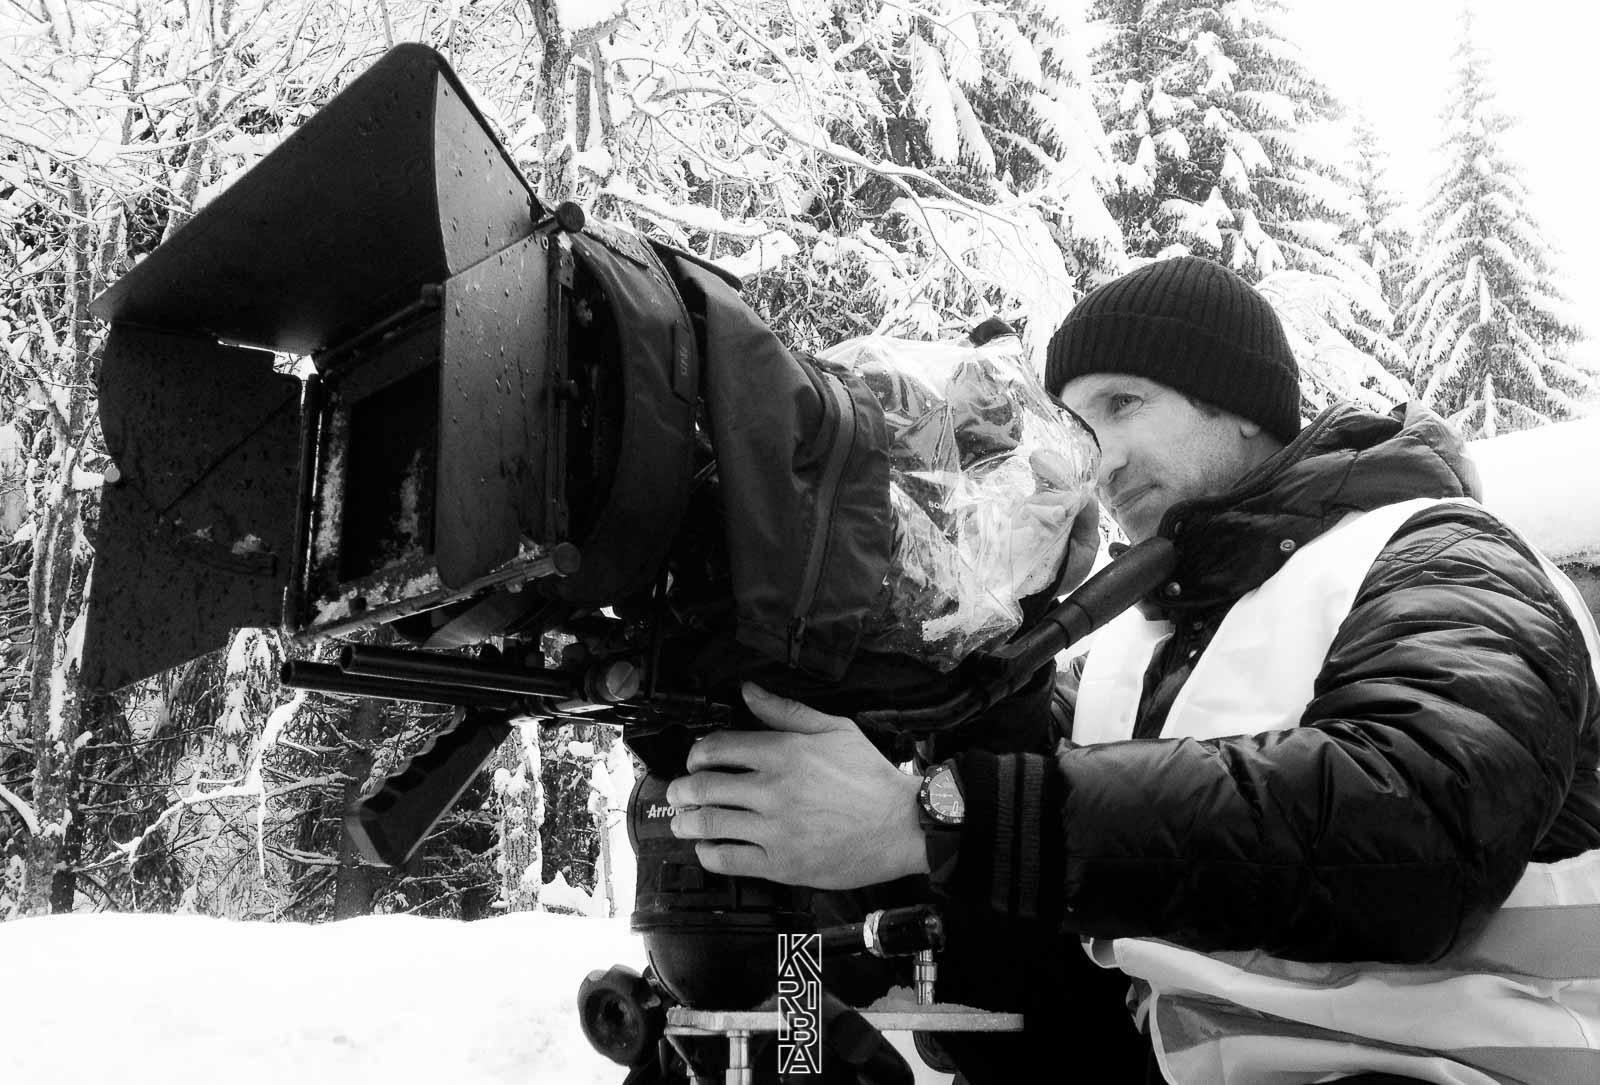 quadrimex-le film-making of-28.jpg